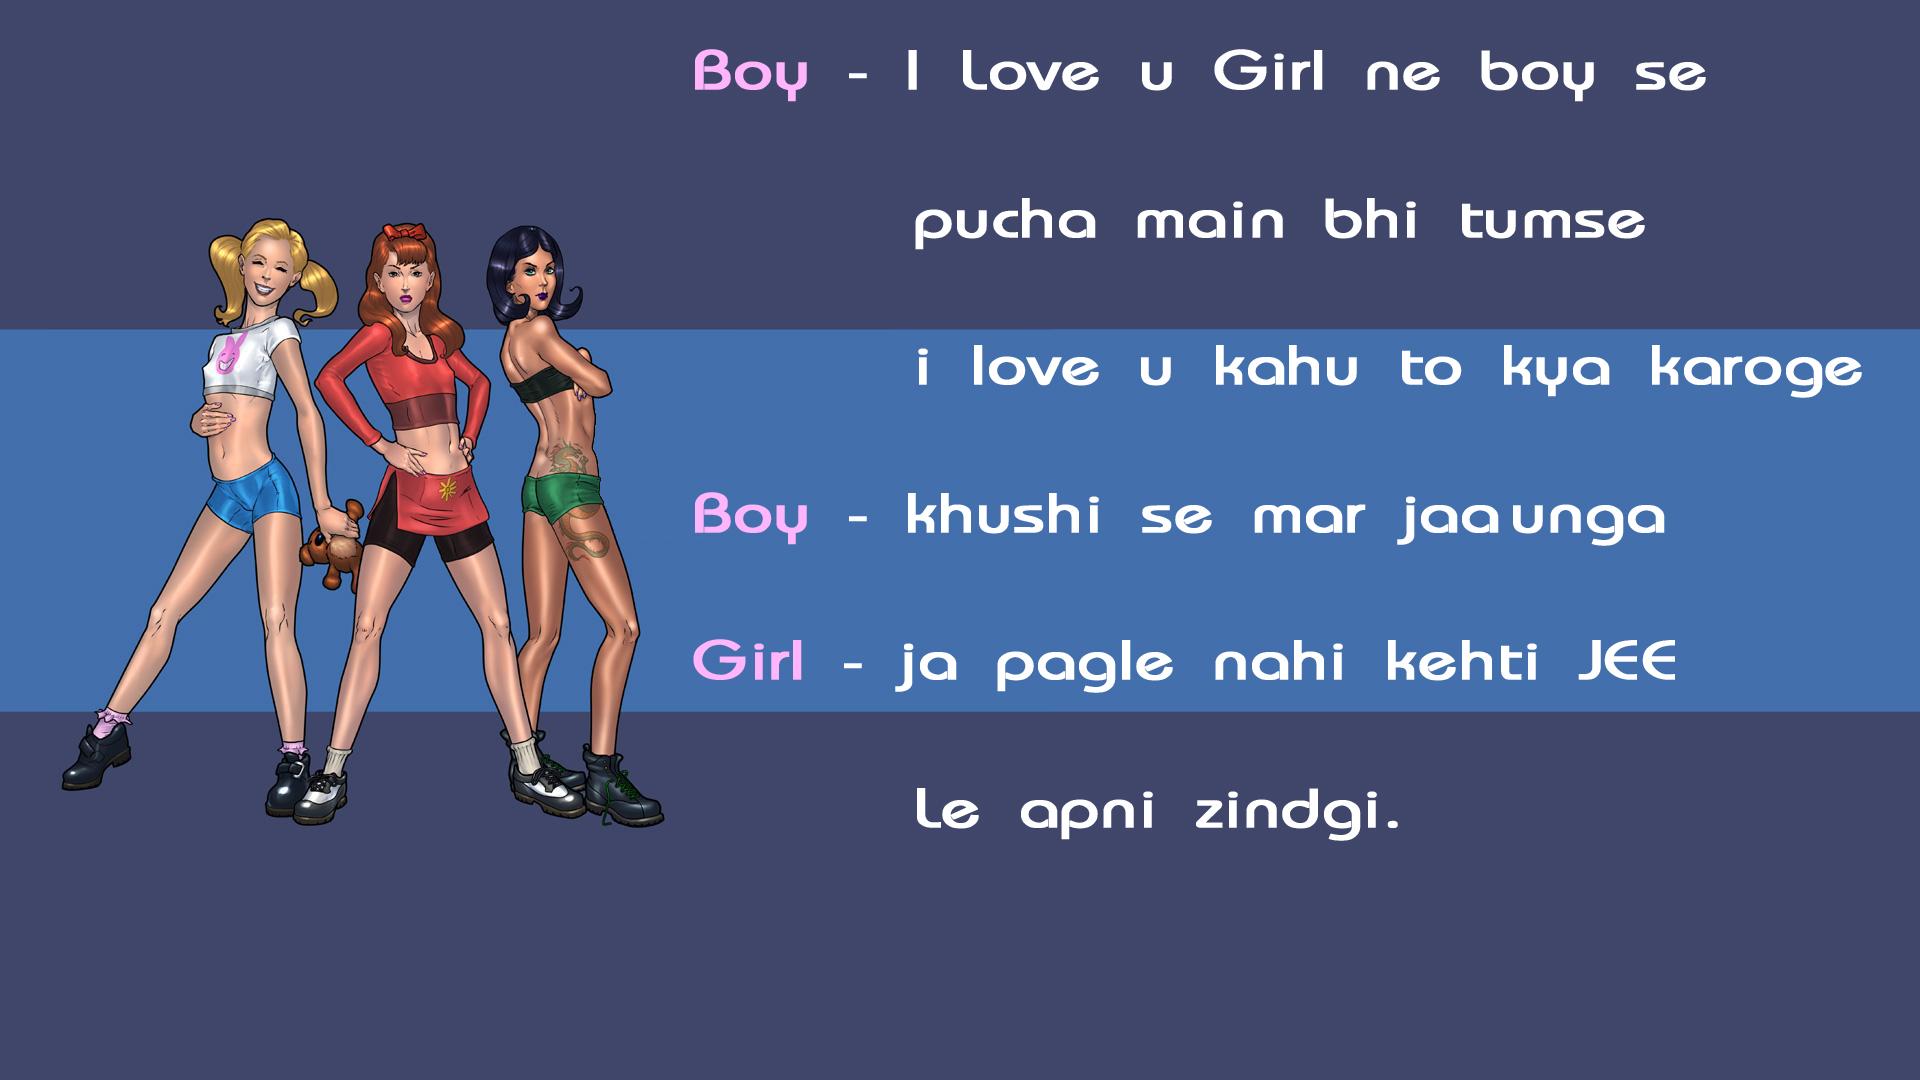 Wallpaper download jokes - Boy Girl Hindi Funny Jokes Wallpaper Jokes Cards